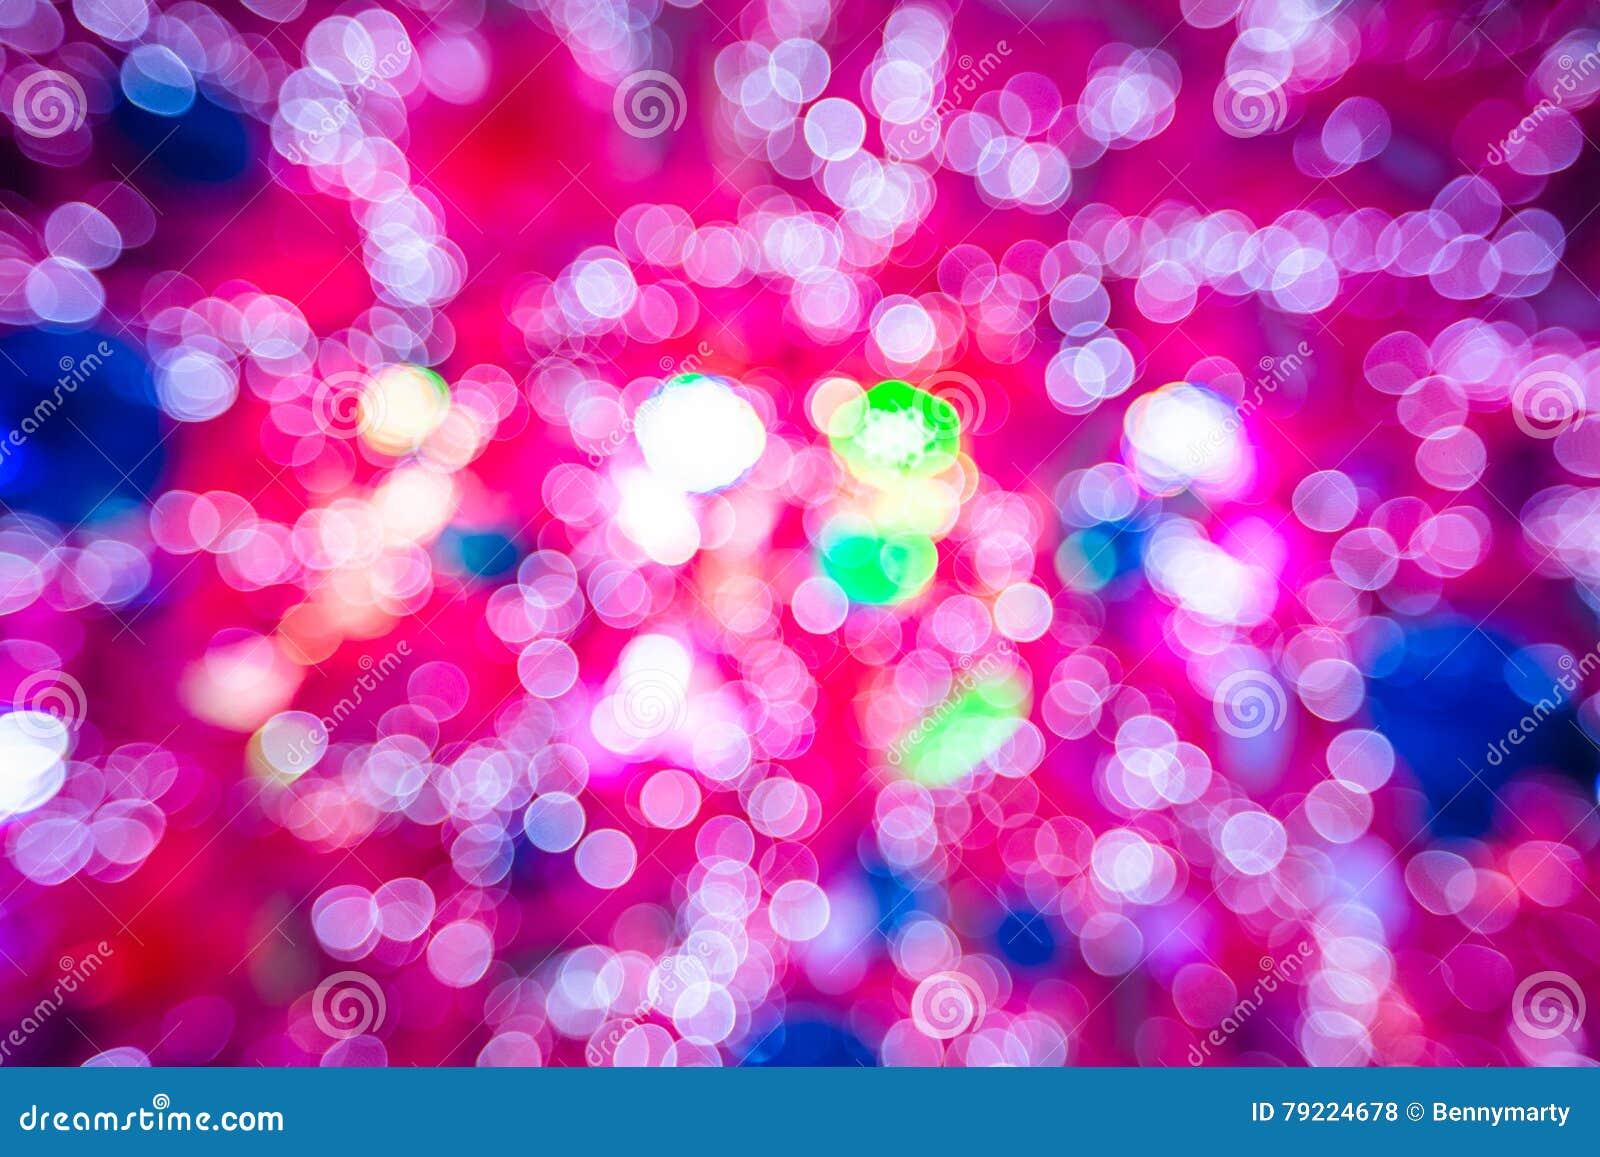 Pink Christmas Lights Stock Photo Image Of Celebration